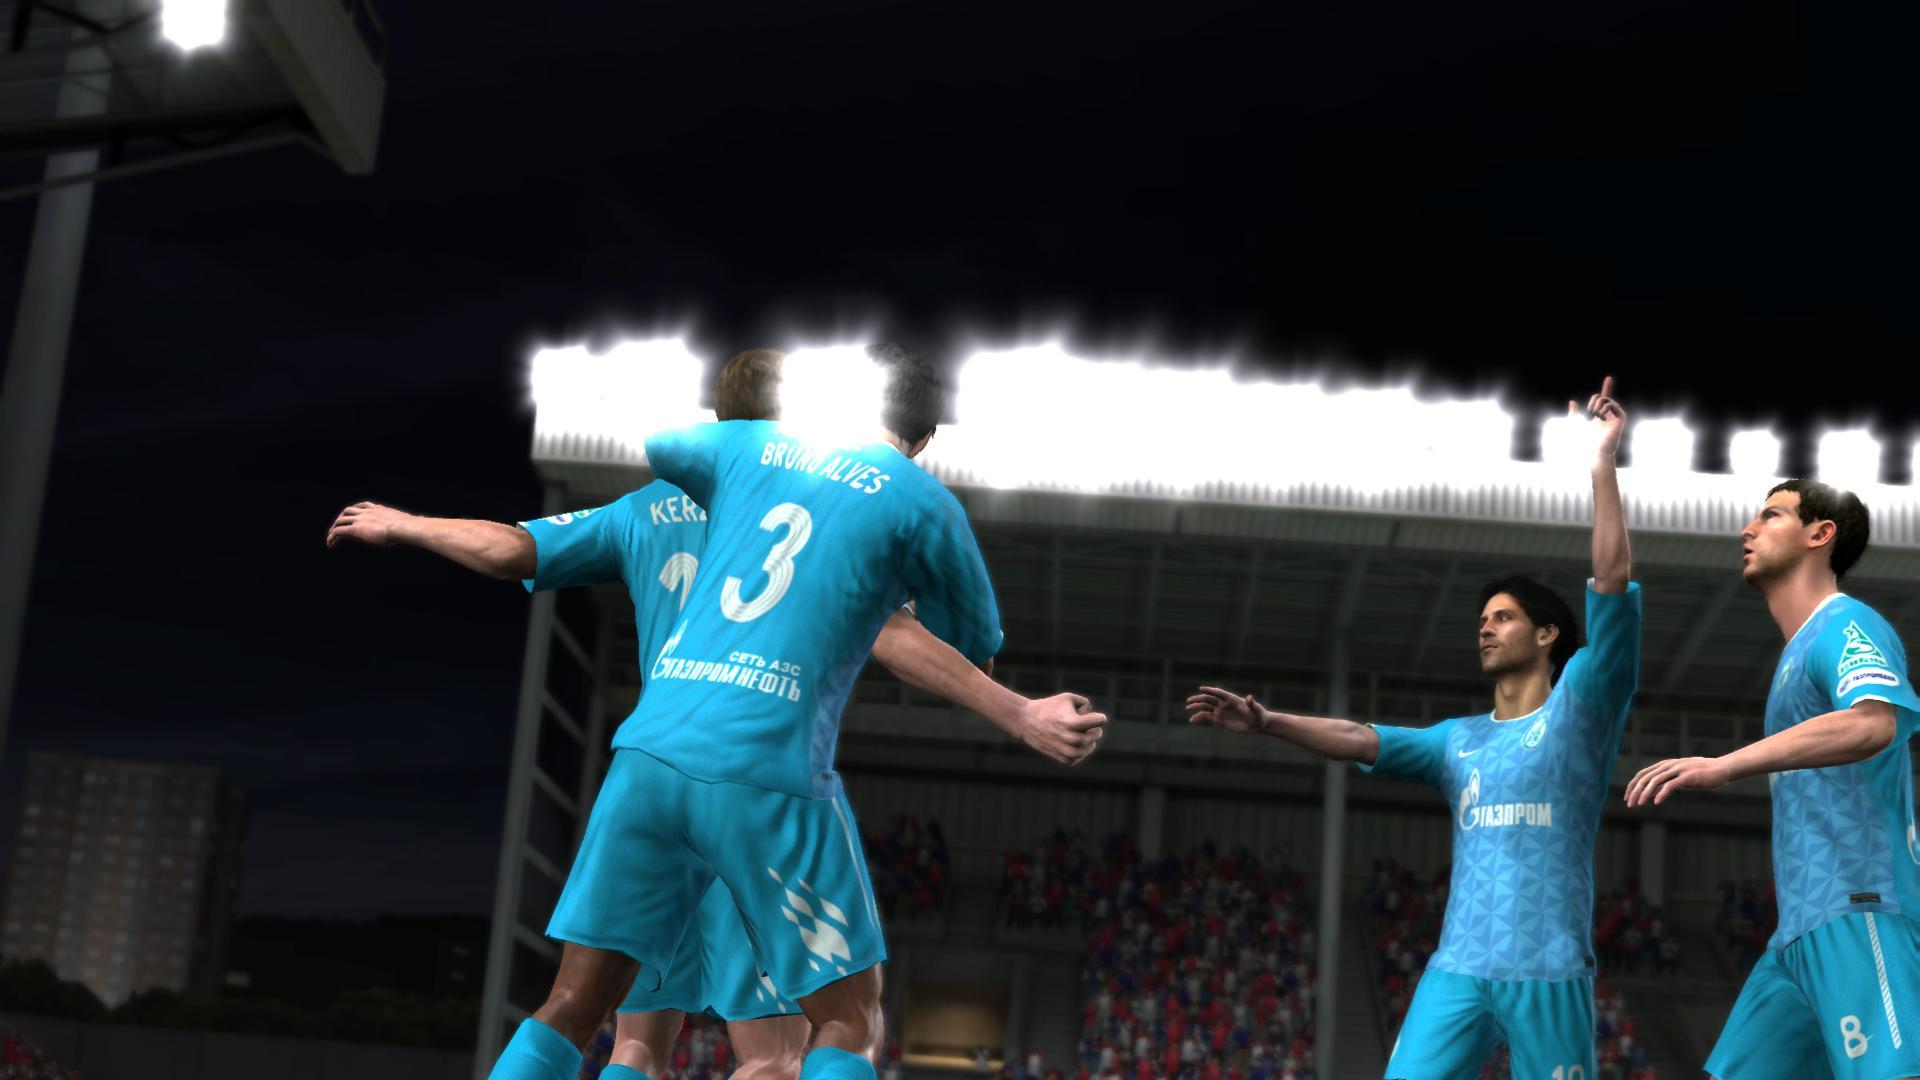 fifa 2011-08-08 23-12-35-41.jpg - FIFA 11